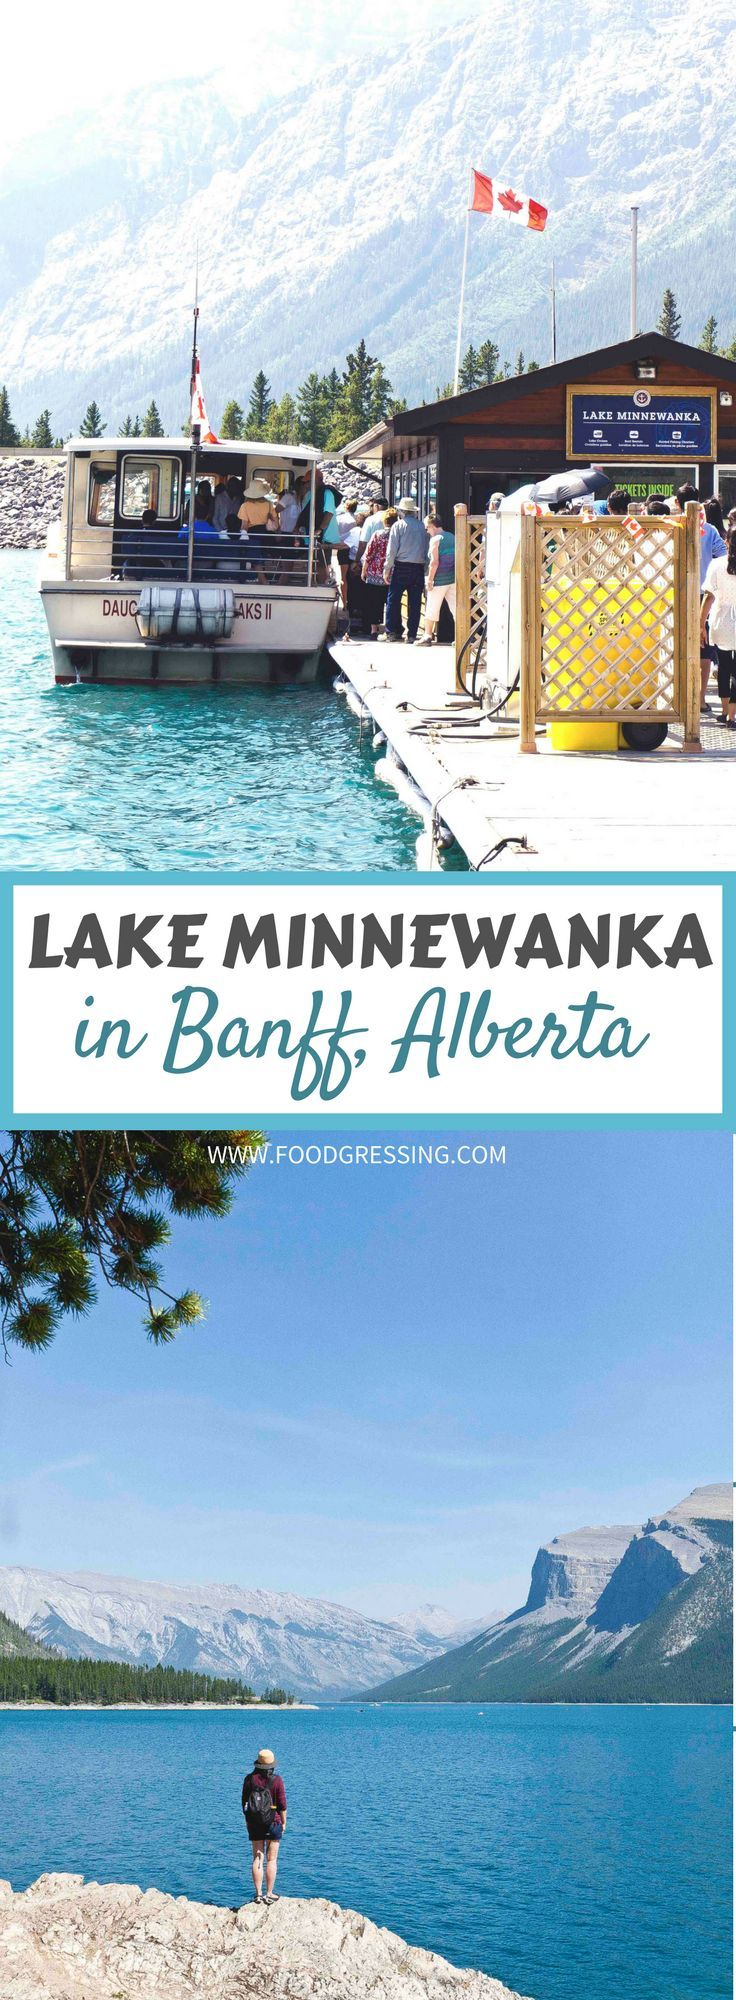 What you need to know before you visit Lake Minnewanka in Banff Alberta ** #Banff | Banff Alberta | Banff Travel | Banff Things To Do | Banff Vacation | Banff Weekend | What to do in Banff | Banff Attractions